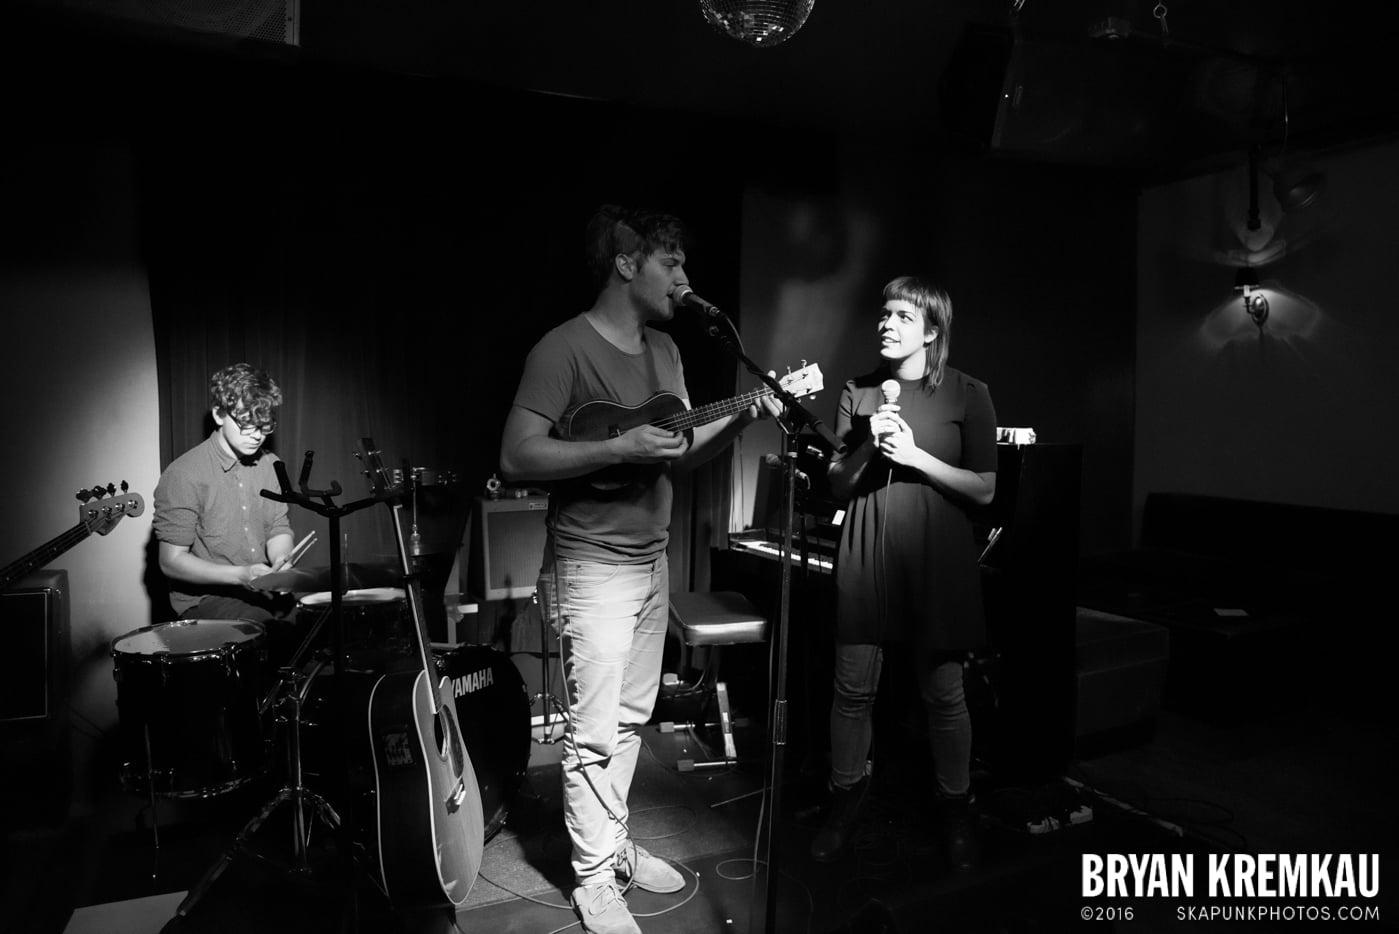 Jordan Klassen @ Bowery Electric, NYC - 10.9.13 (7)